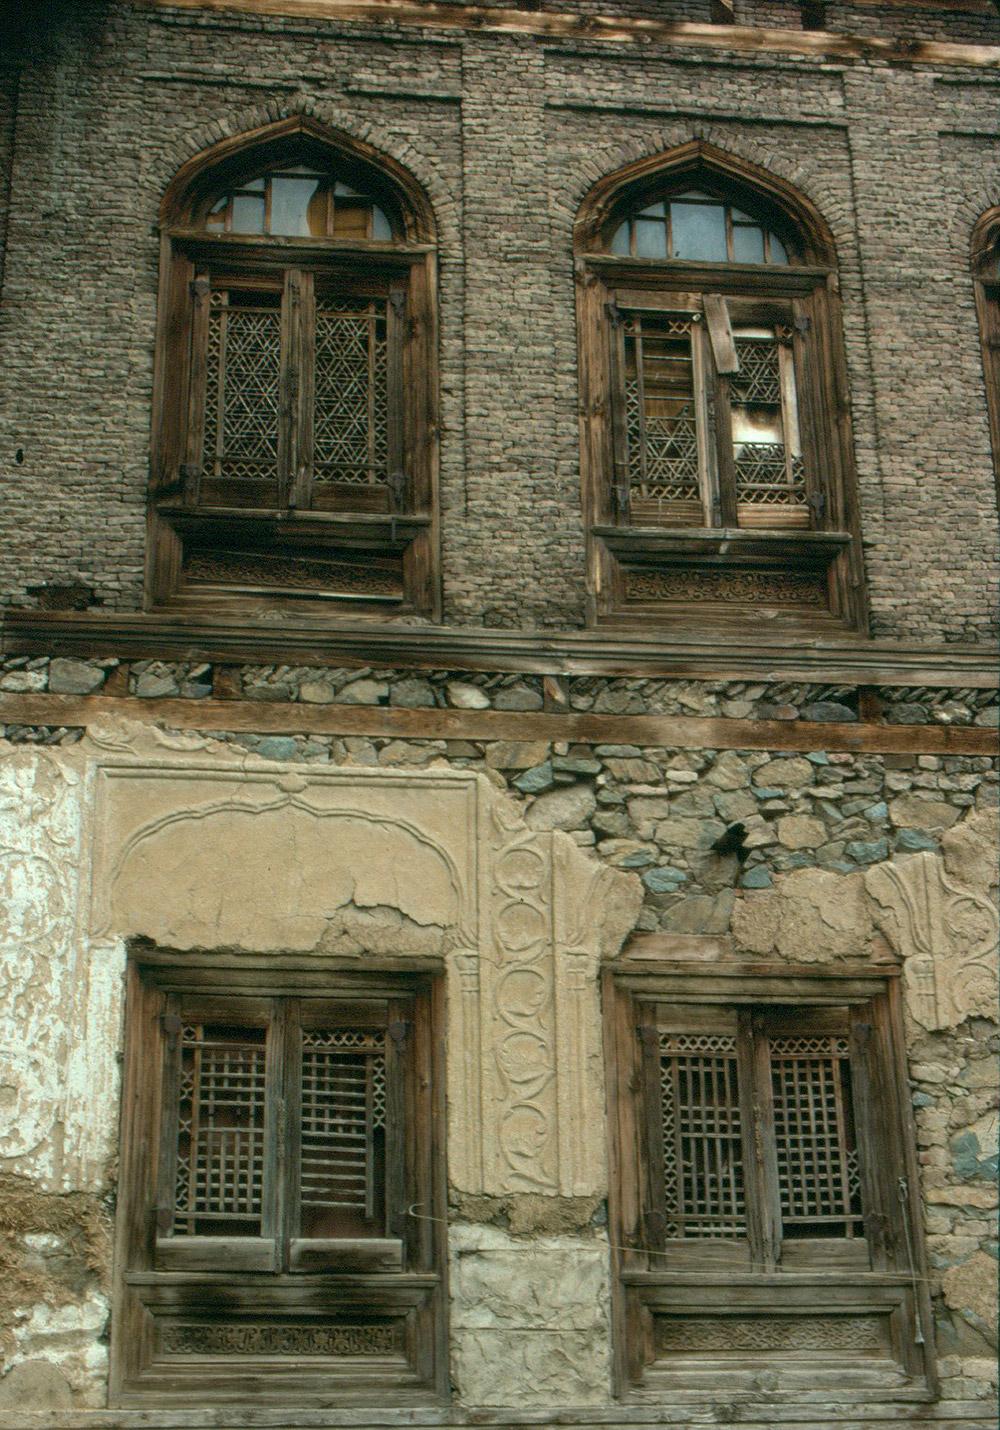 Dhajji Diwari with stucco exterior on the ground floor, Taq construction with brick piers above. Photo credit: Anuradha Chaturvedi